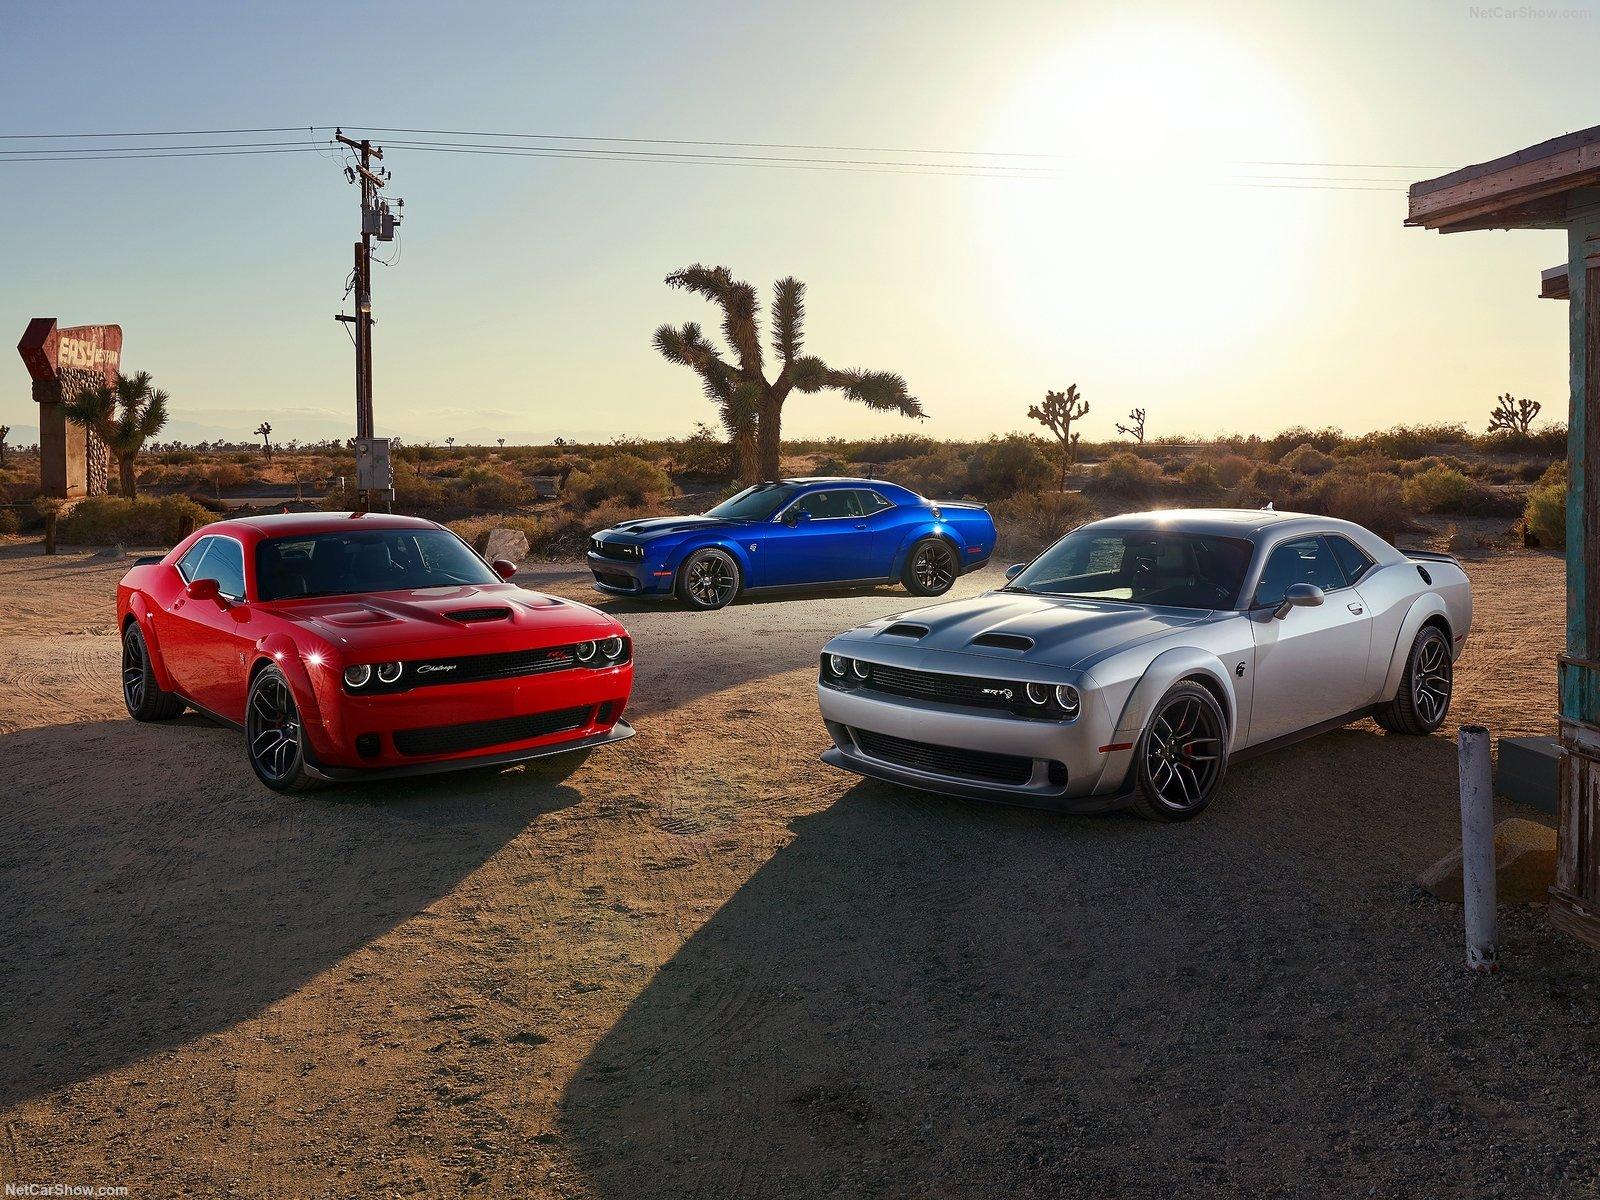 2019 Dodge Challenger Srt Hellcat Redeye Debuts With 797hp Performancedrive